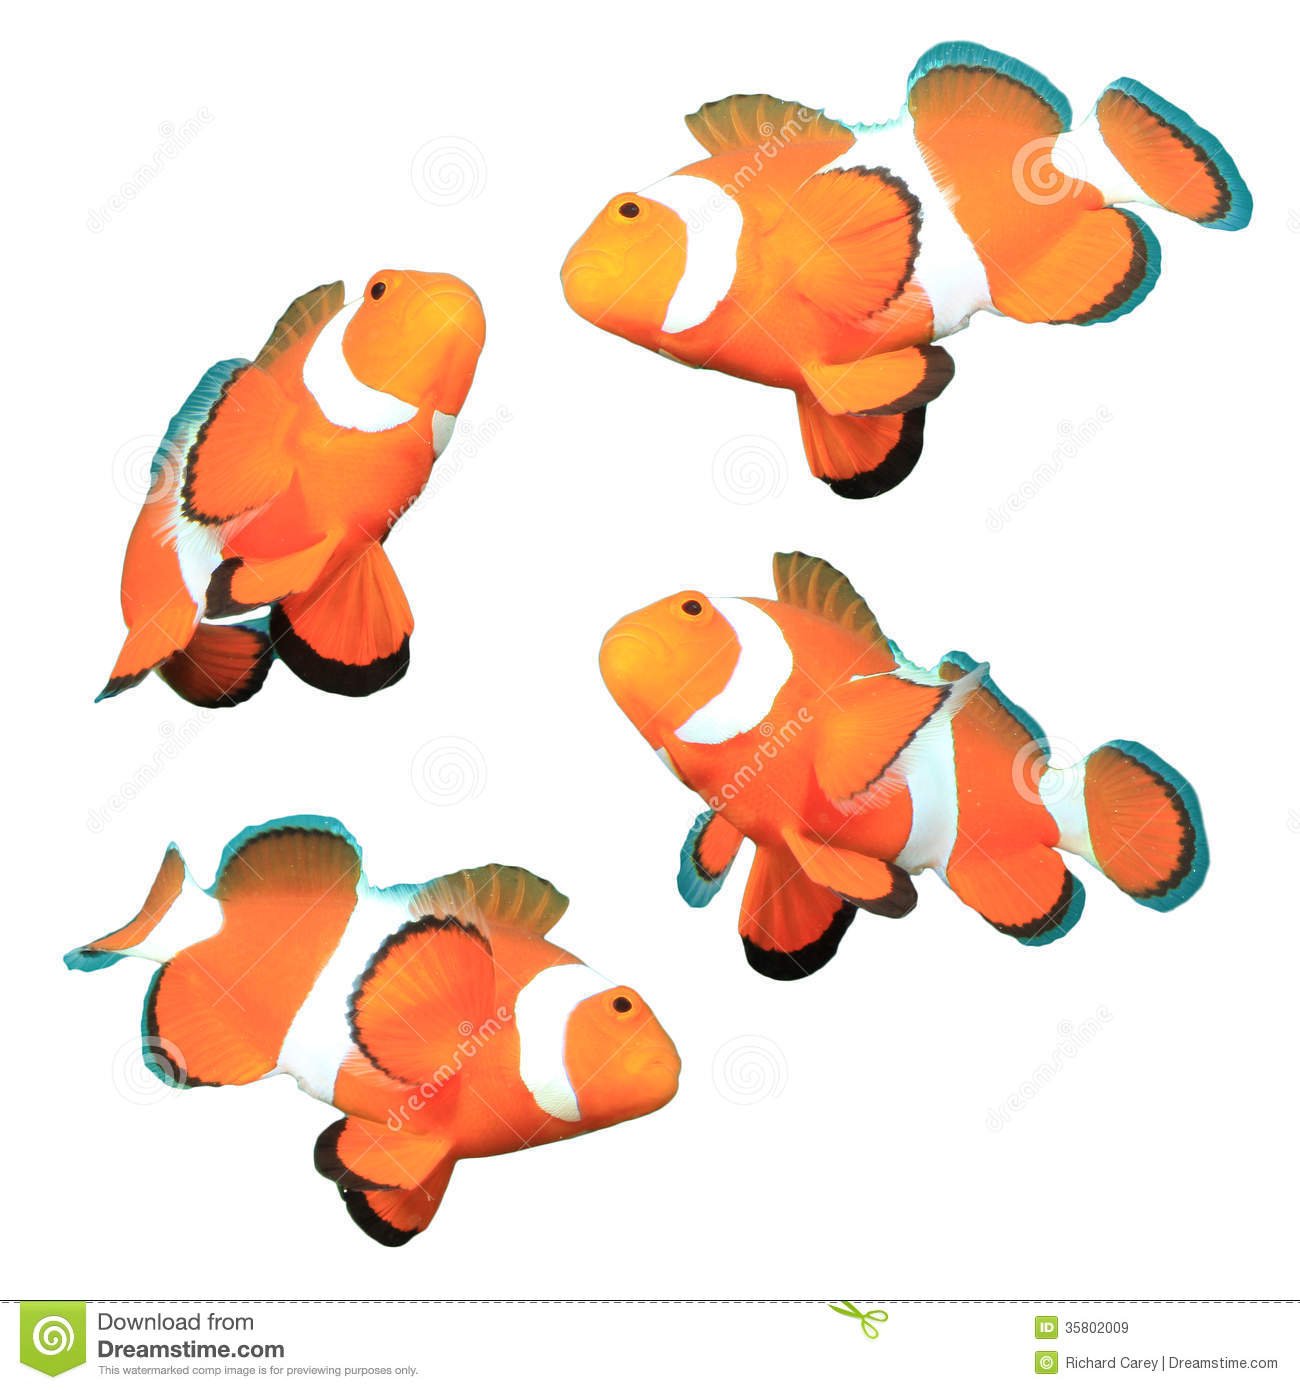 Clownfish Isolated On White Background Royalty Free Stock Images.